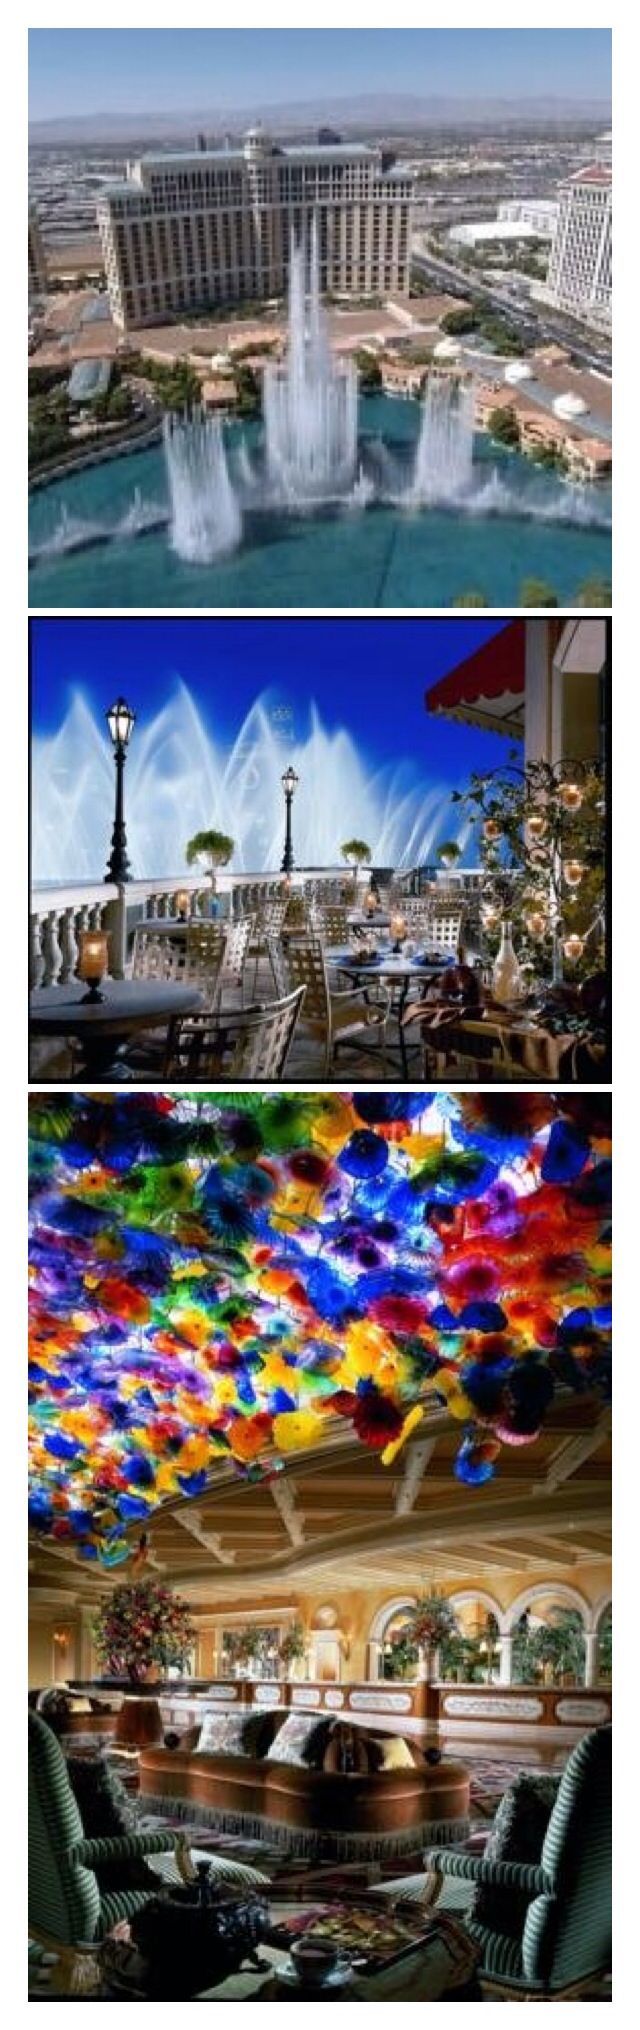 ~The Bellagio Hotel/Casino - Las Vegas Strip Nevada | House of Beccaria